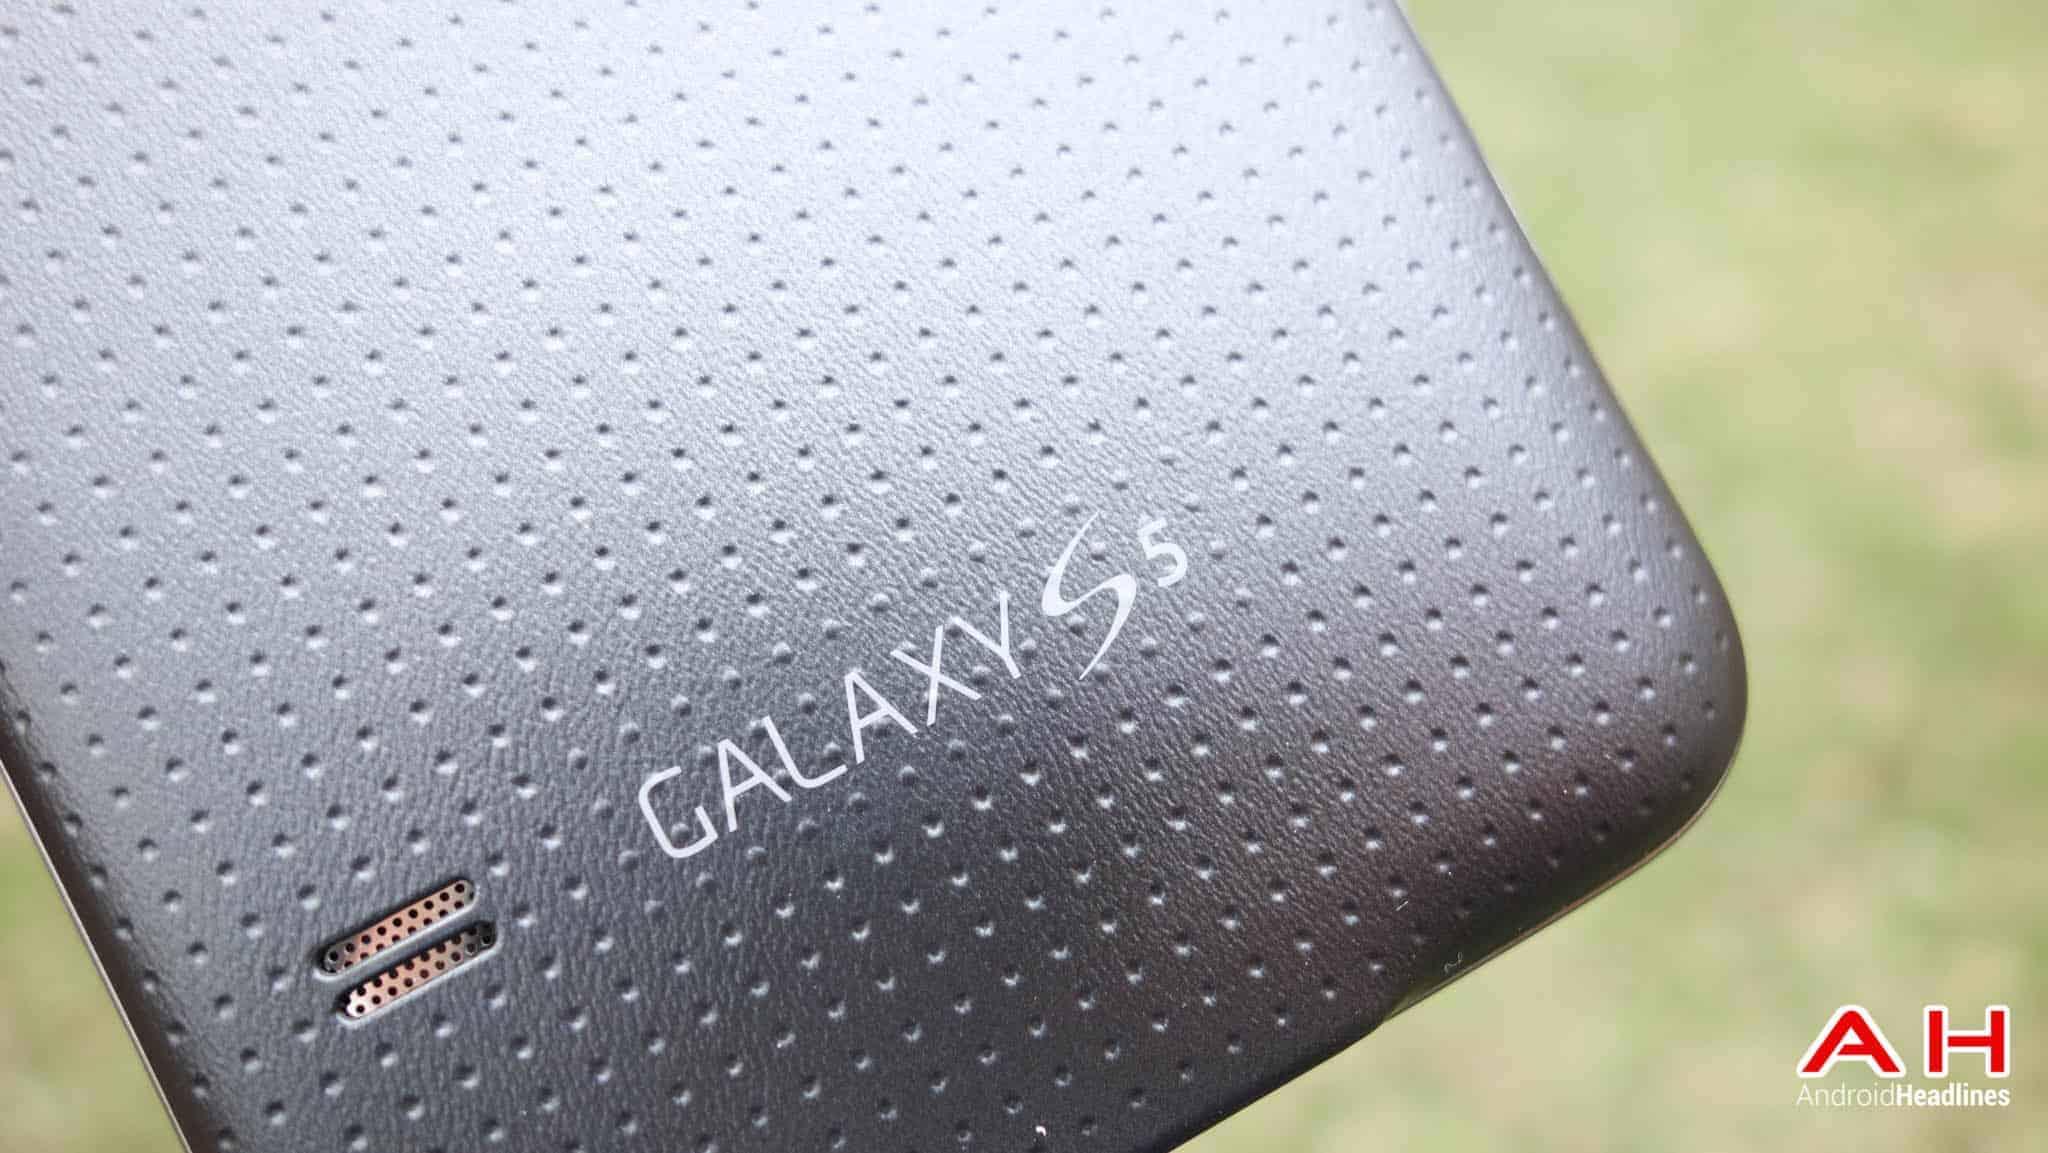 Samsung Galaxy S5 AH 14